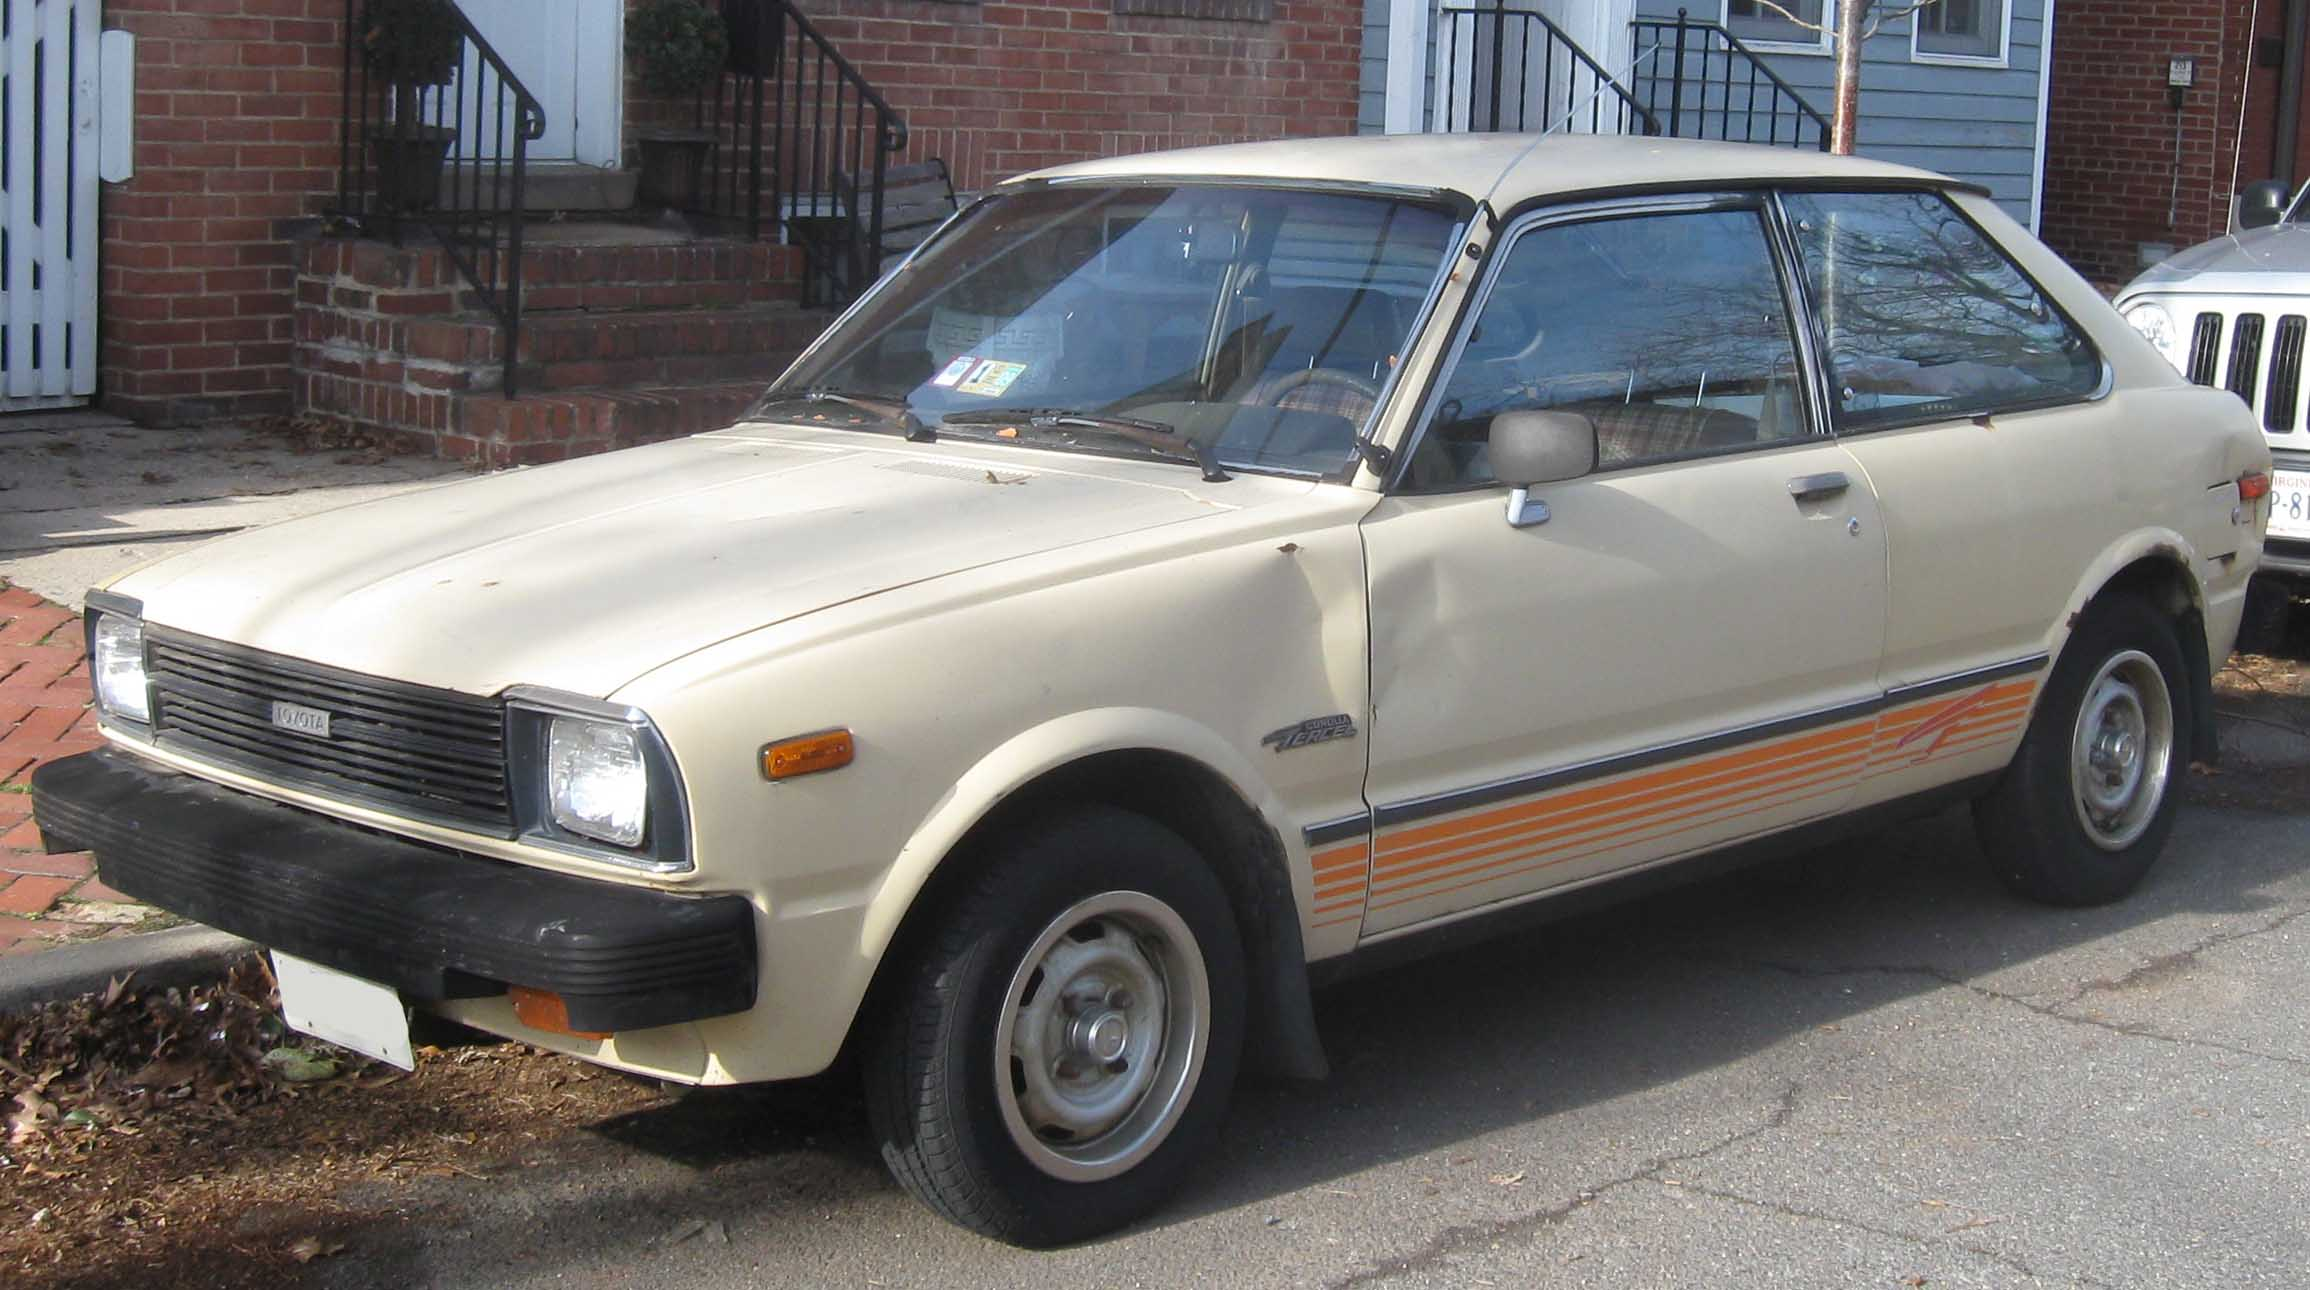 Toyota Corolla II III (L30) 1986 - 1990 Hatchback 5 door #6